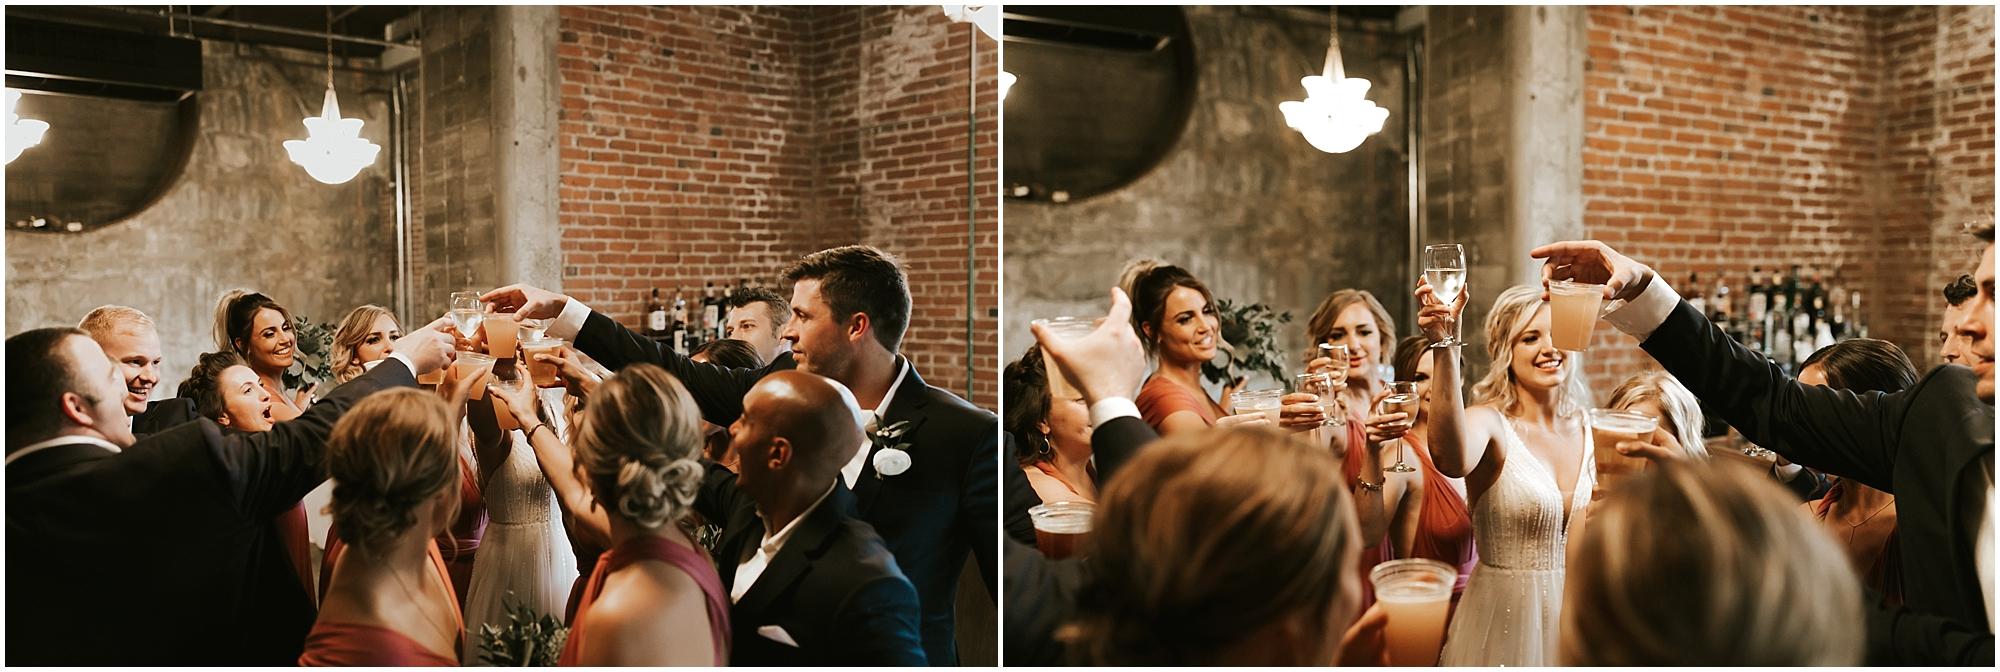 Chateau Rive Spokane Wedding Cassie Trottier Photography1094.jpg